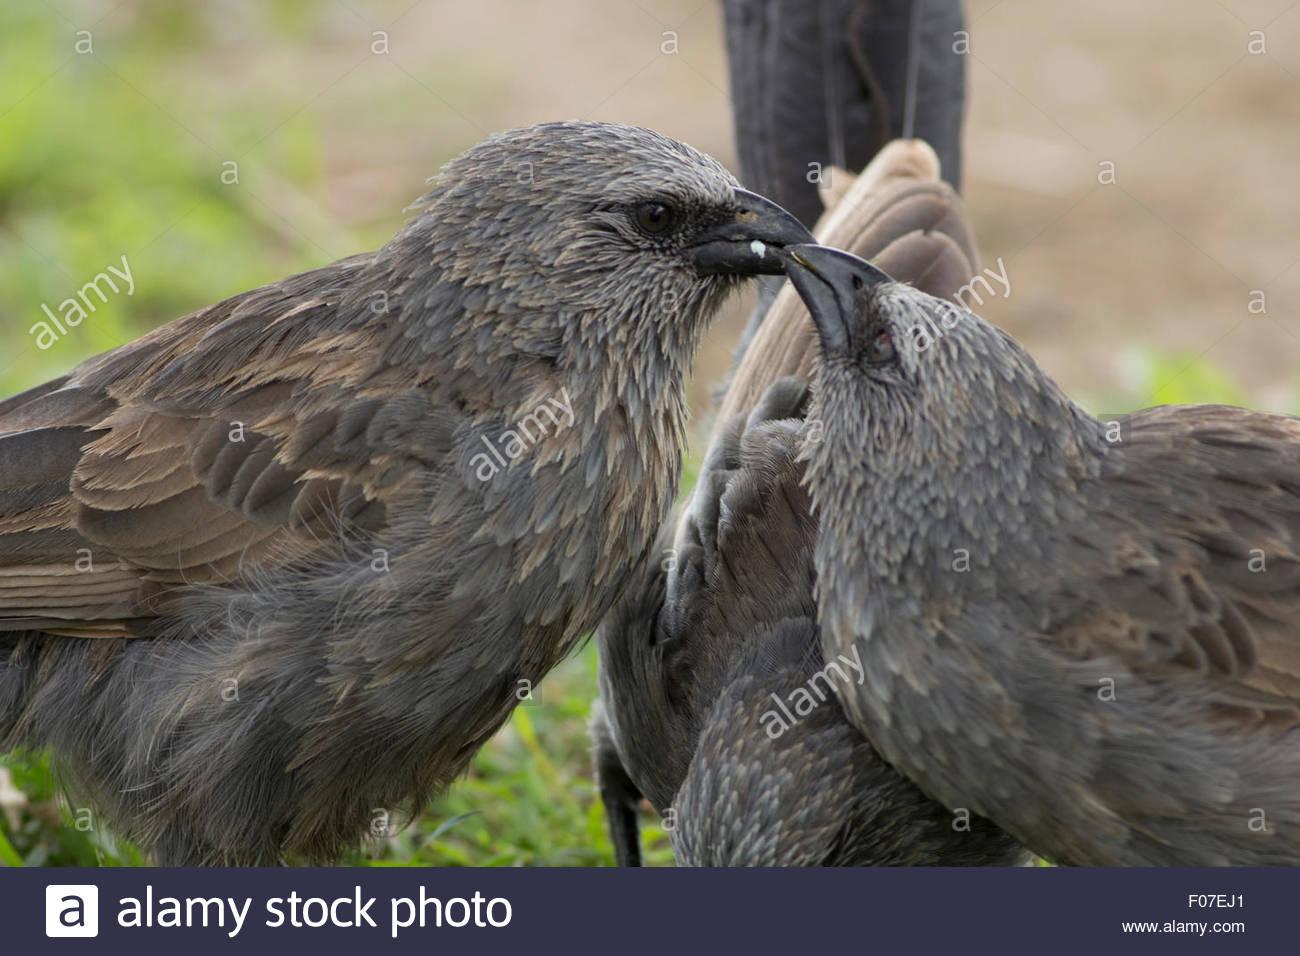 Apostlebird feeding large juvenile. - Stock Image